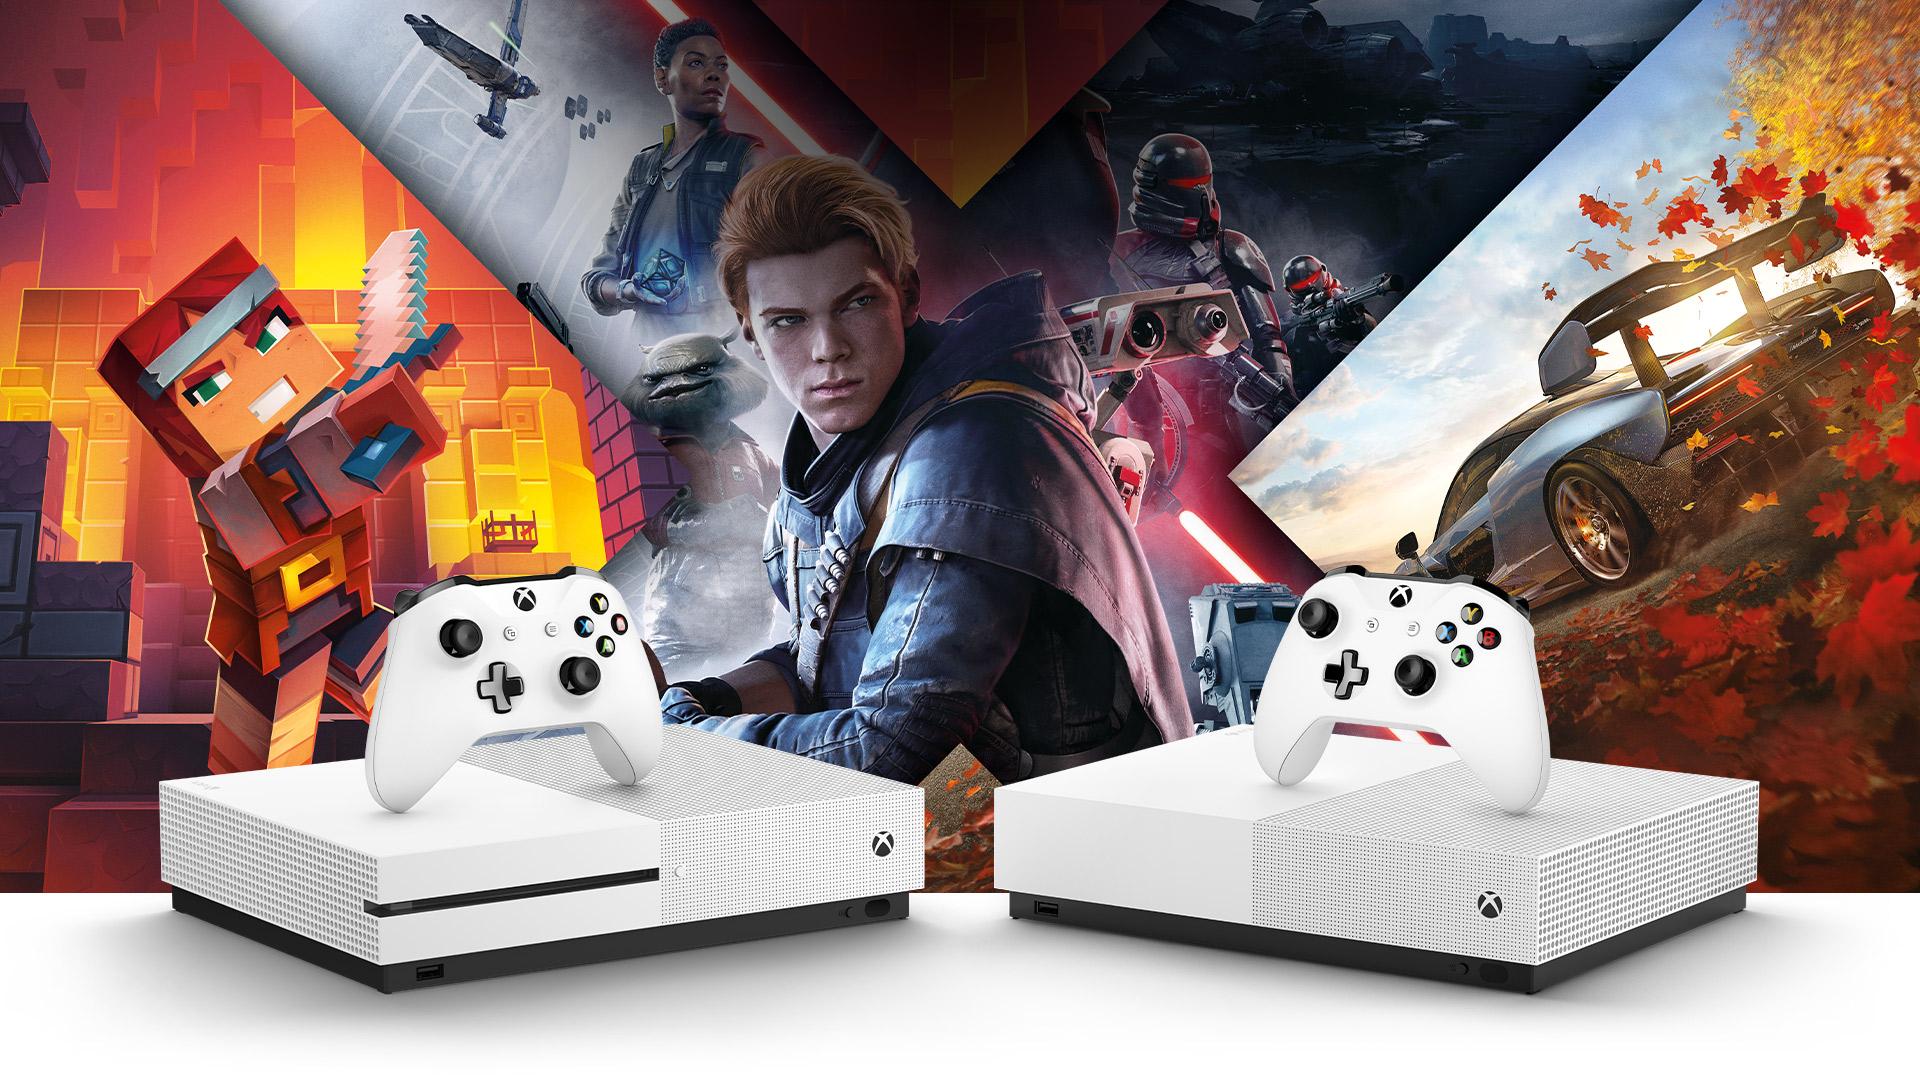 کنسول بازي مايکروسافت مدل Xbox One S